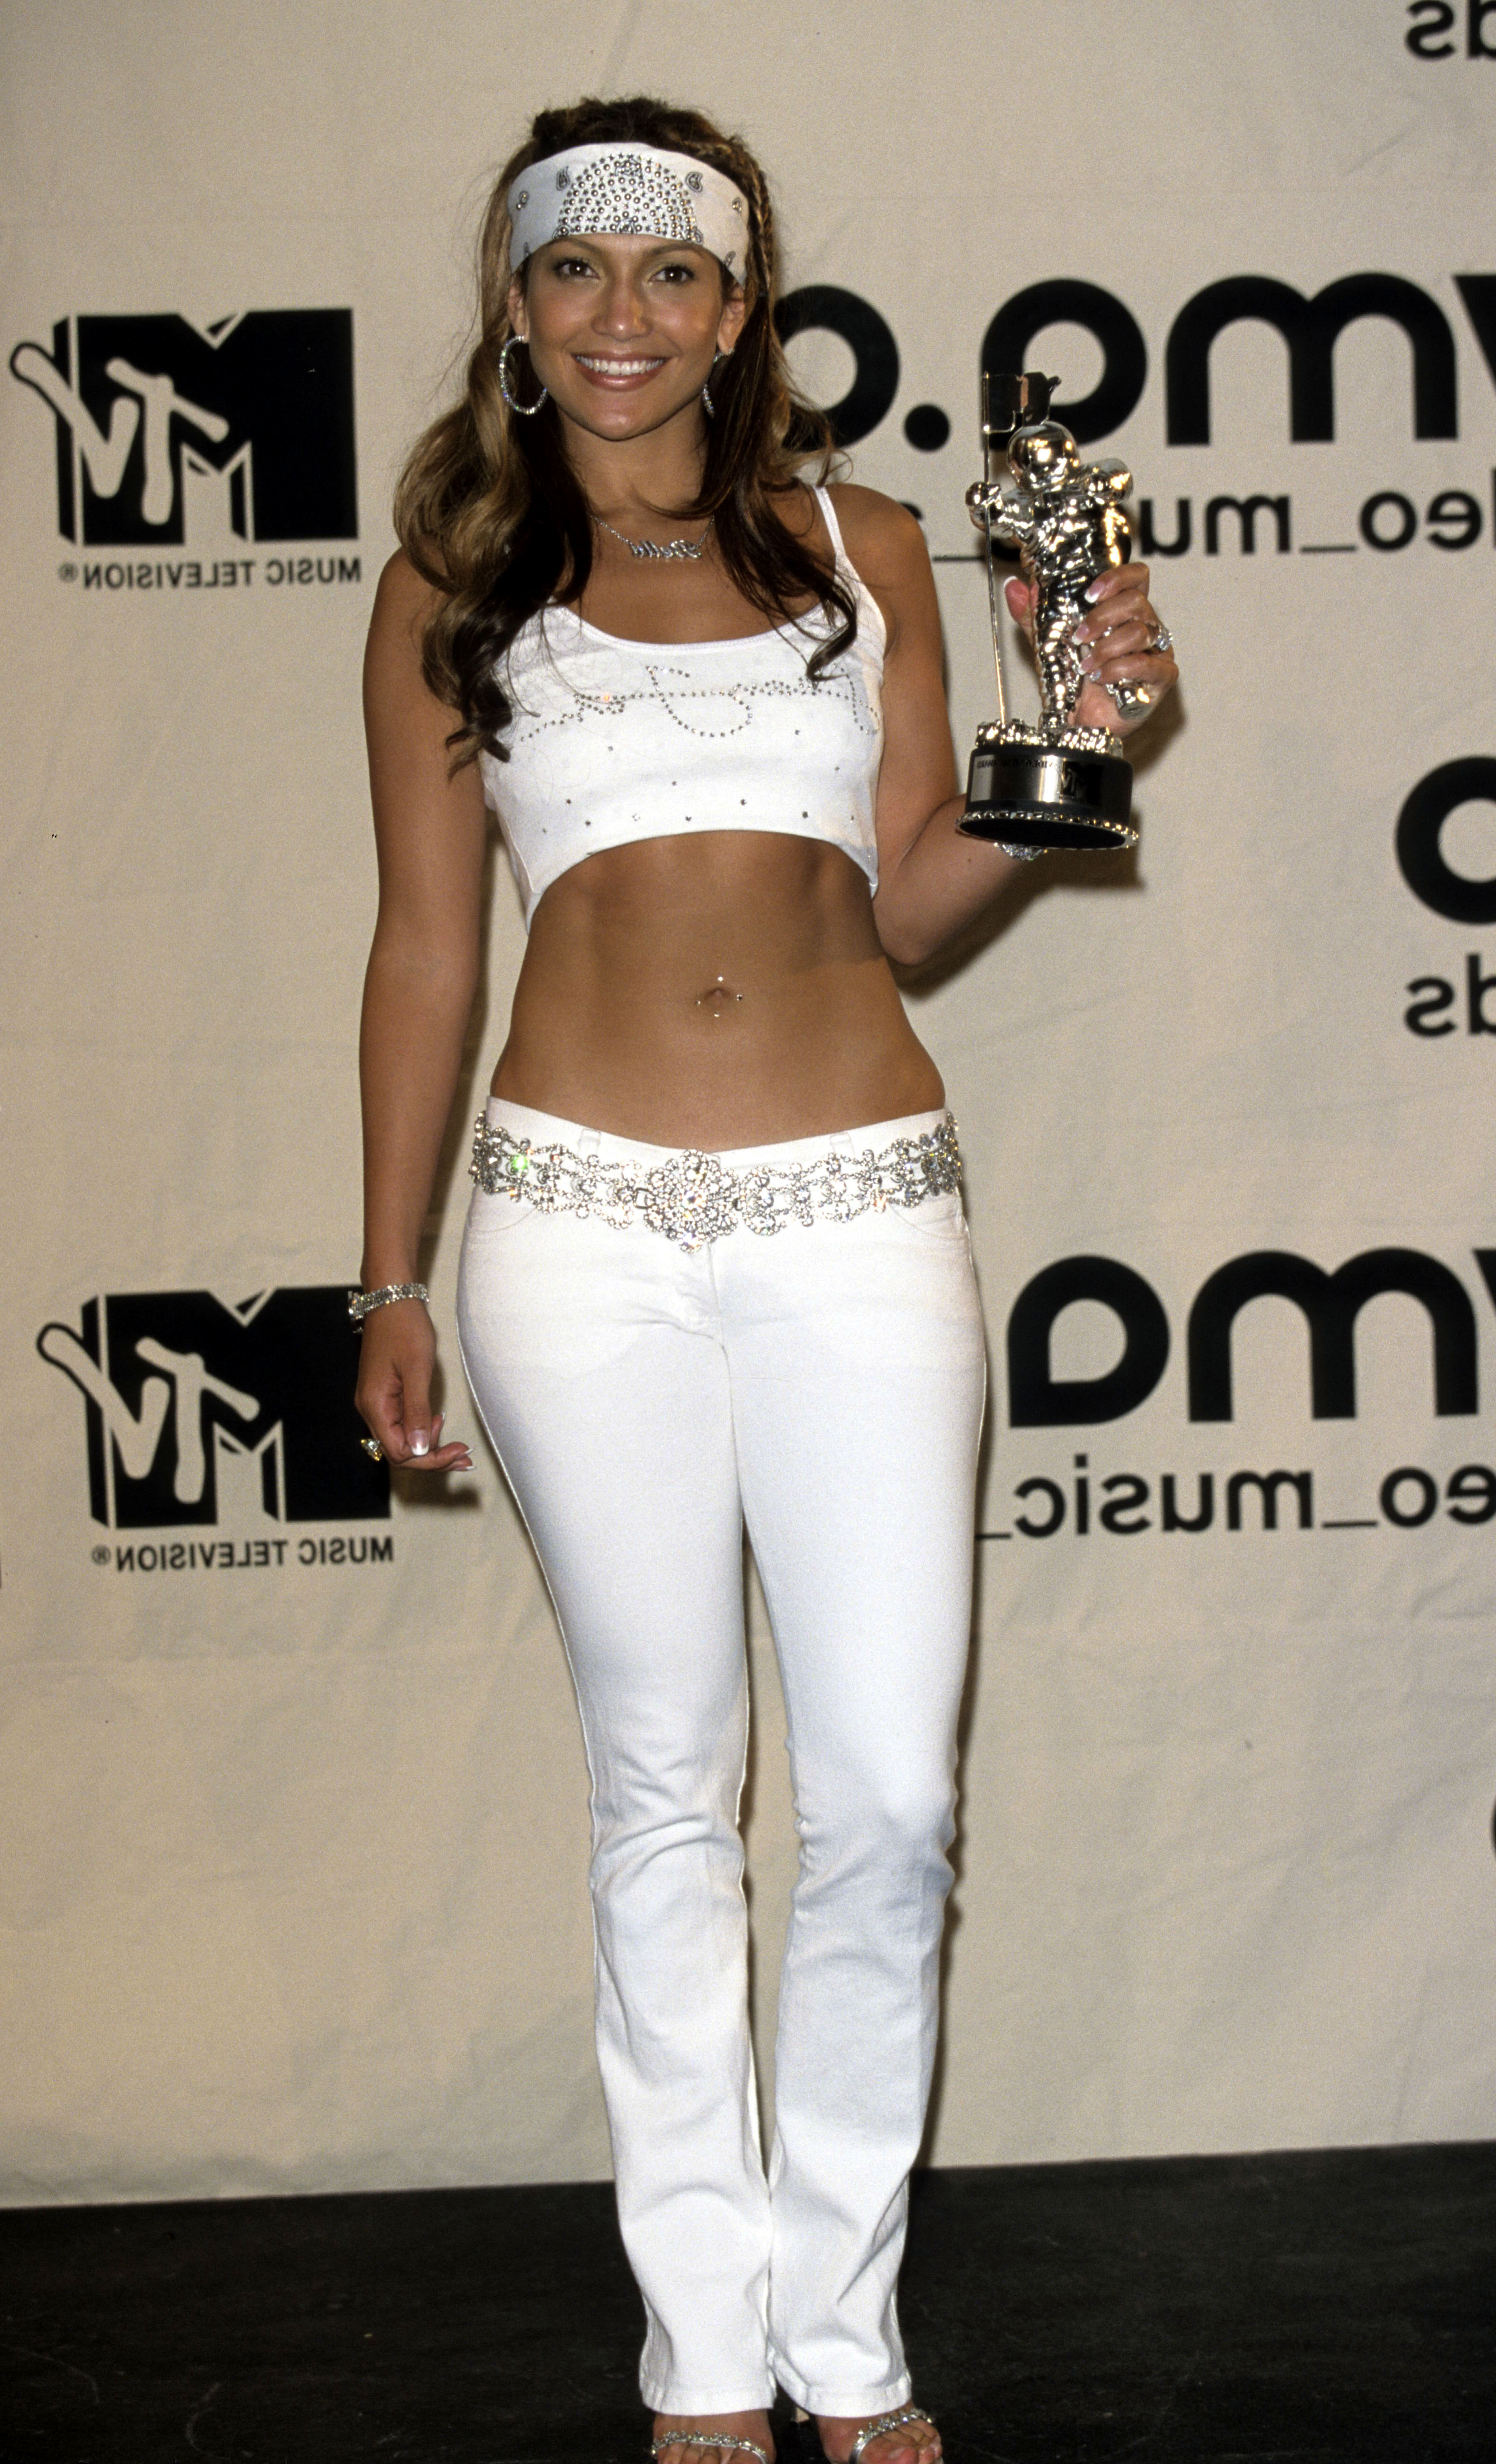 Fashion flashback to the 2000 MTV VMAs | Gallery thumbnail